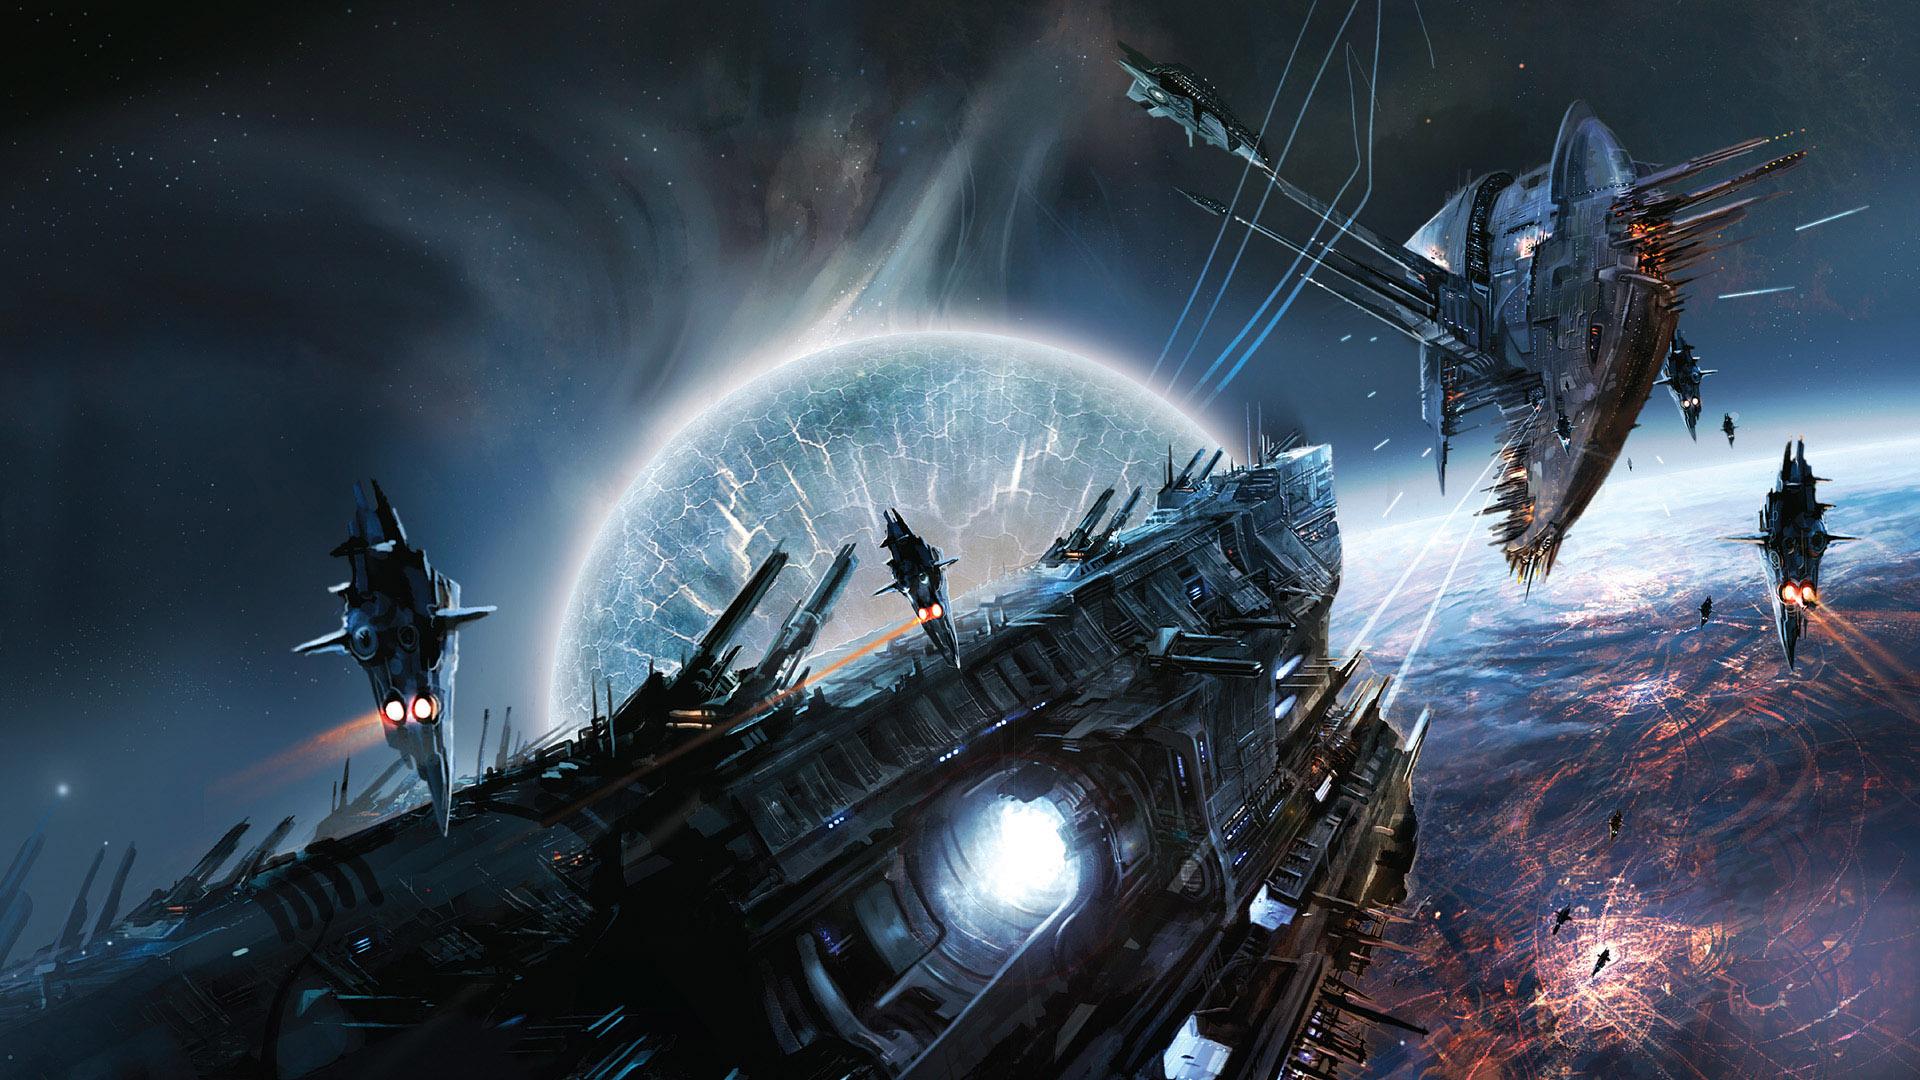 Sfondi desktop fantasy hd guerre spaziali sfondi hd gratis for Sfondi spaziali